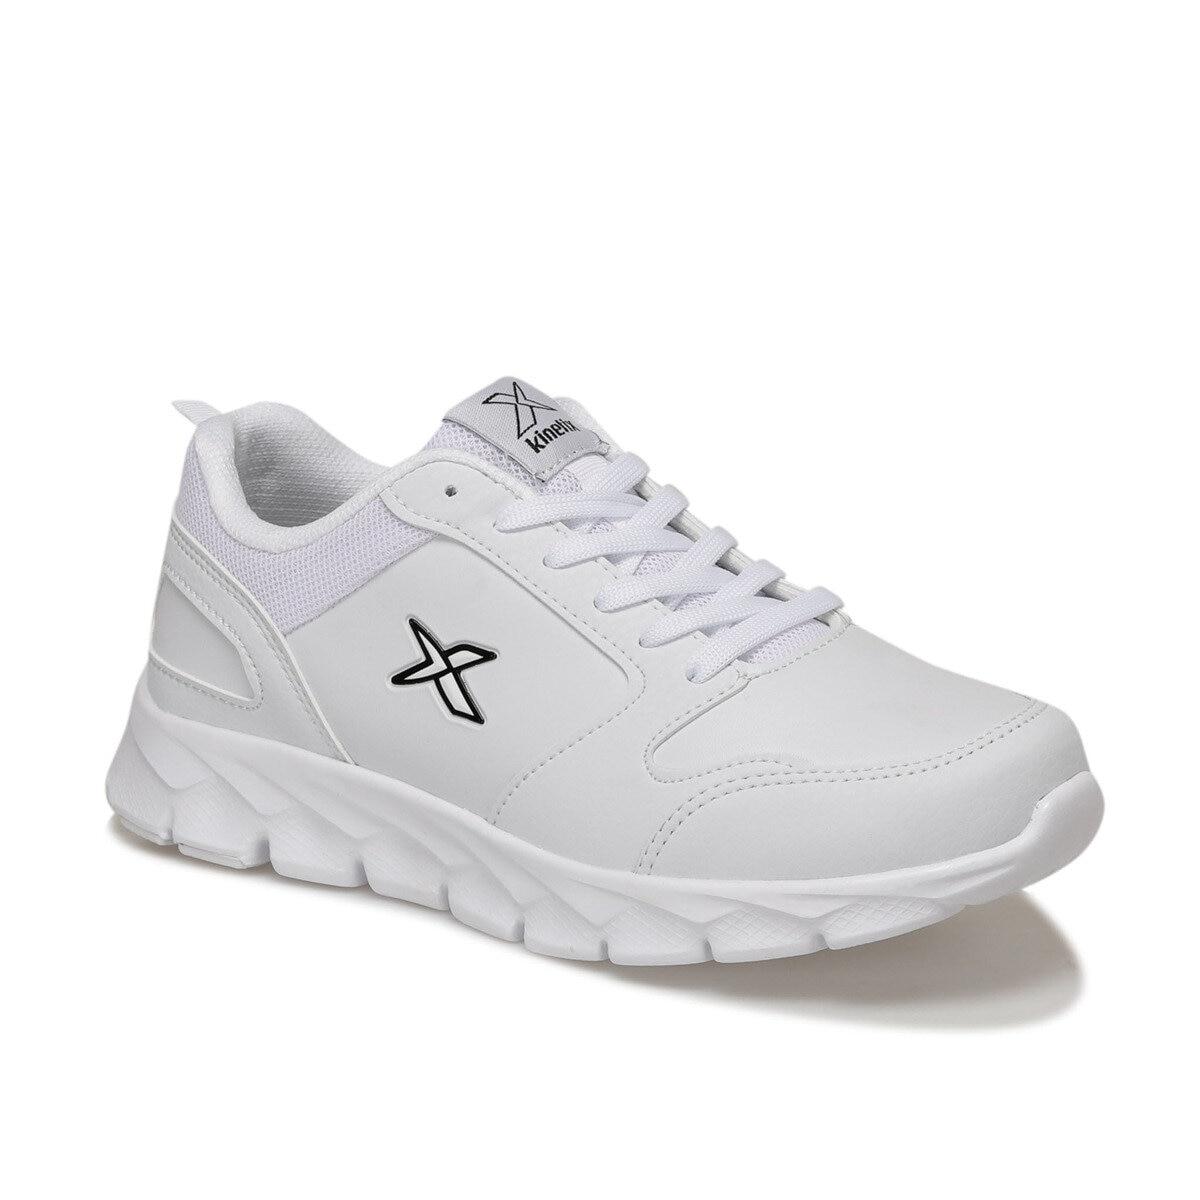 FLO OKA PU W Black Women 'S Running Shoe KINETIX